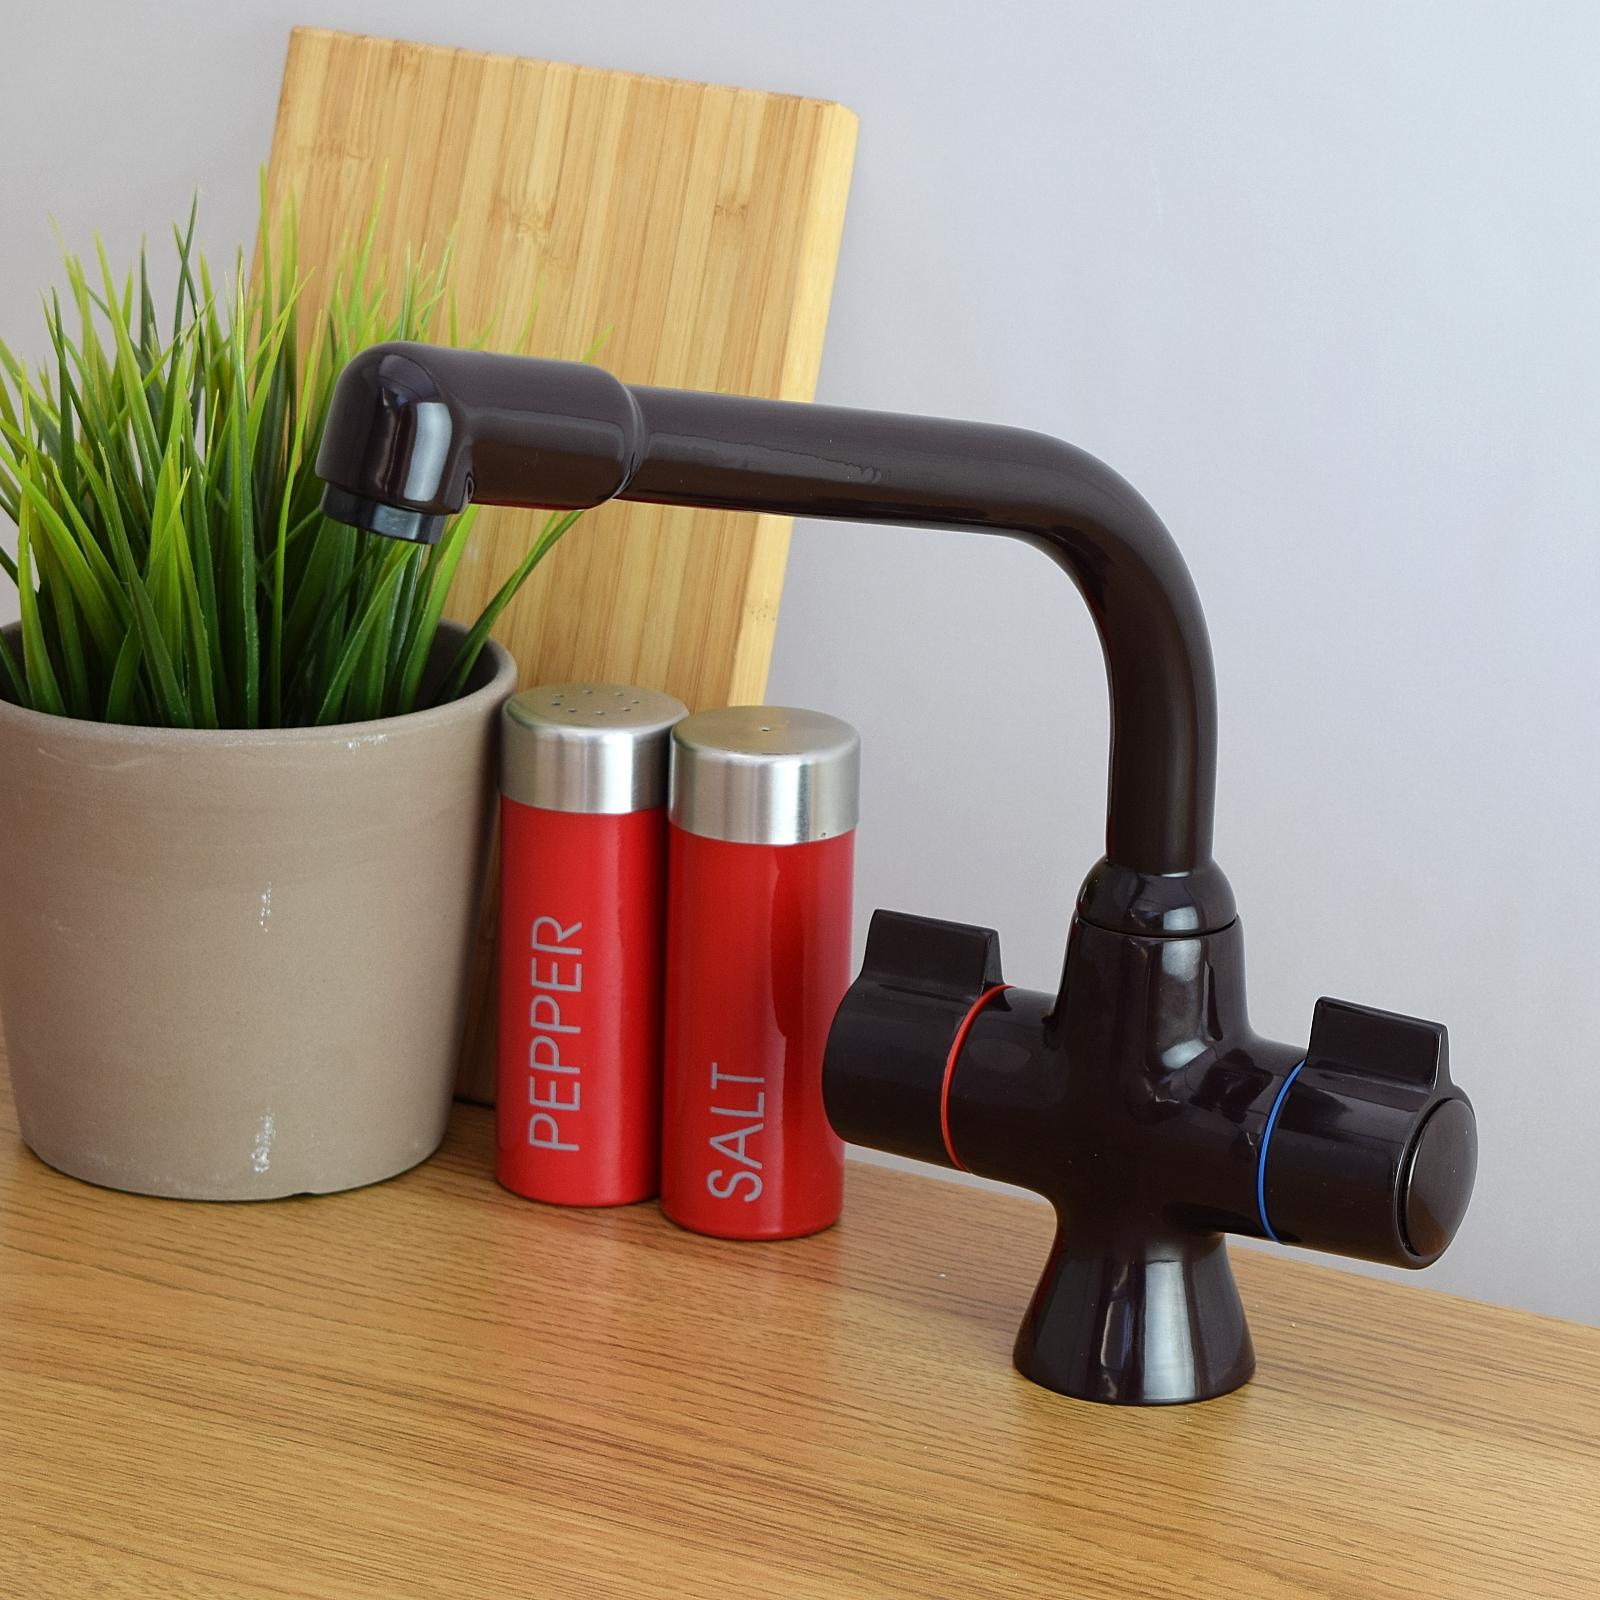 enki mitigeur vier de cuisine l 39 eau du robinet basse pression chrome acier ebay. Black Bedroom Furniture Sets. Home Design Ideas